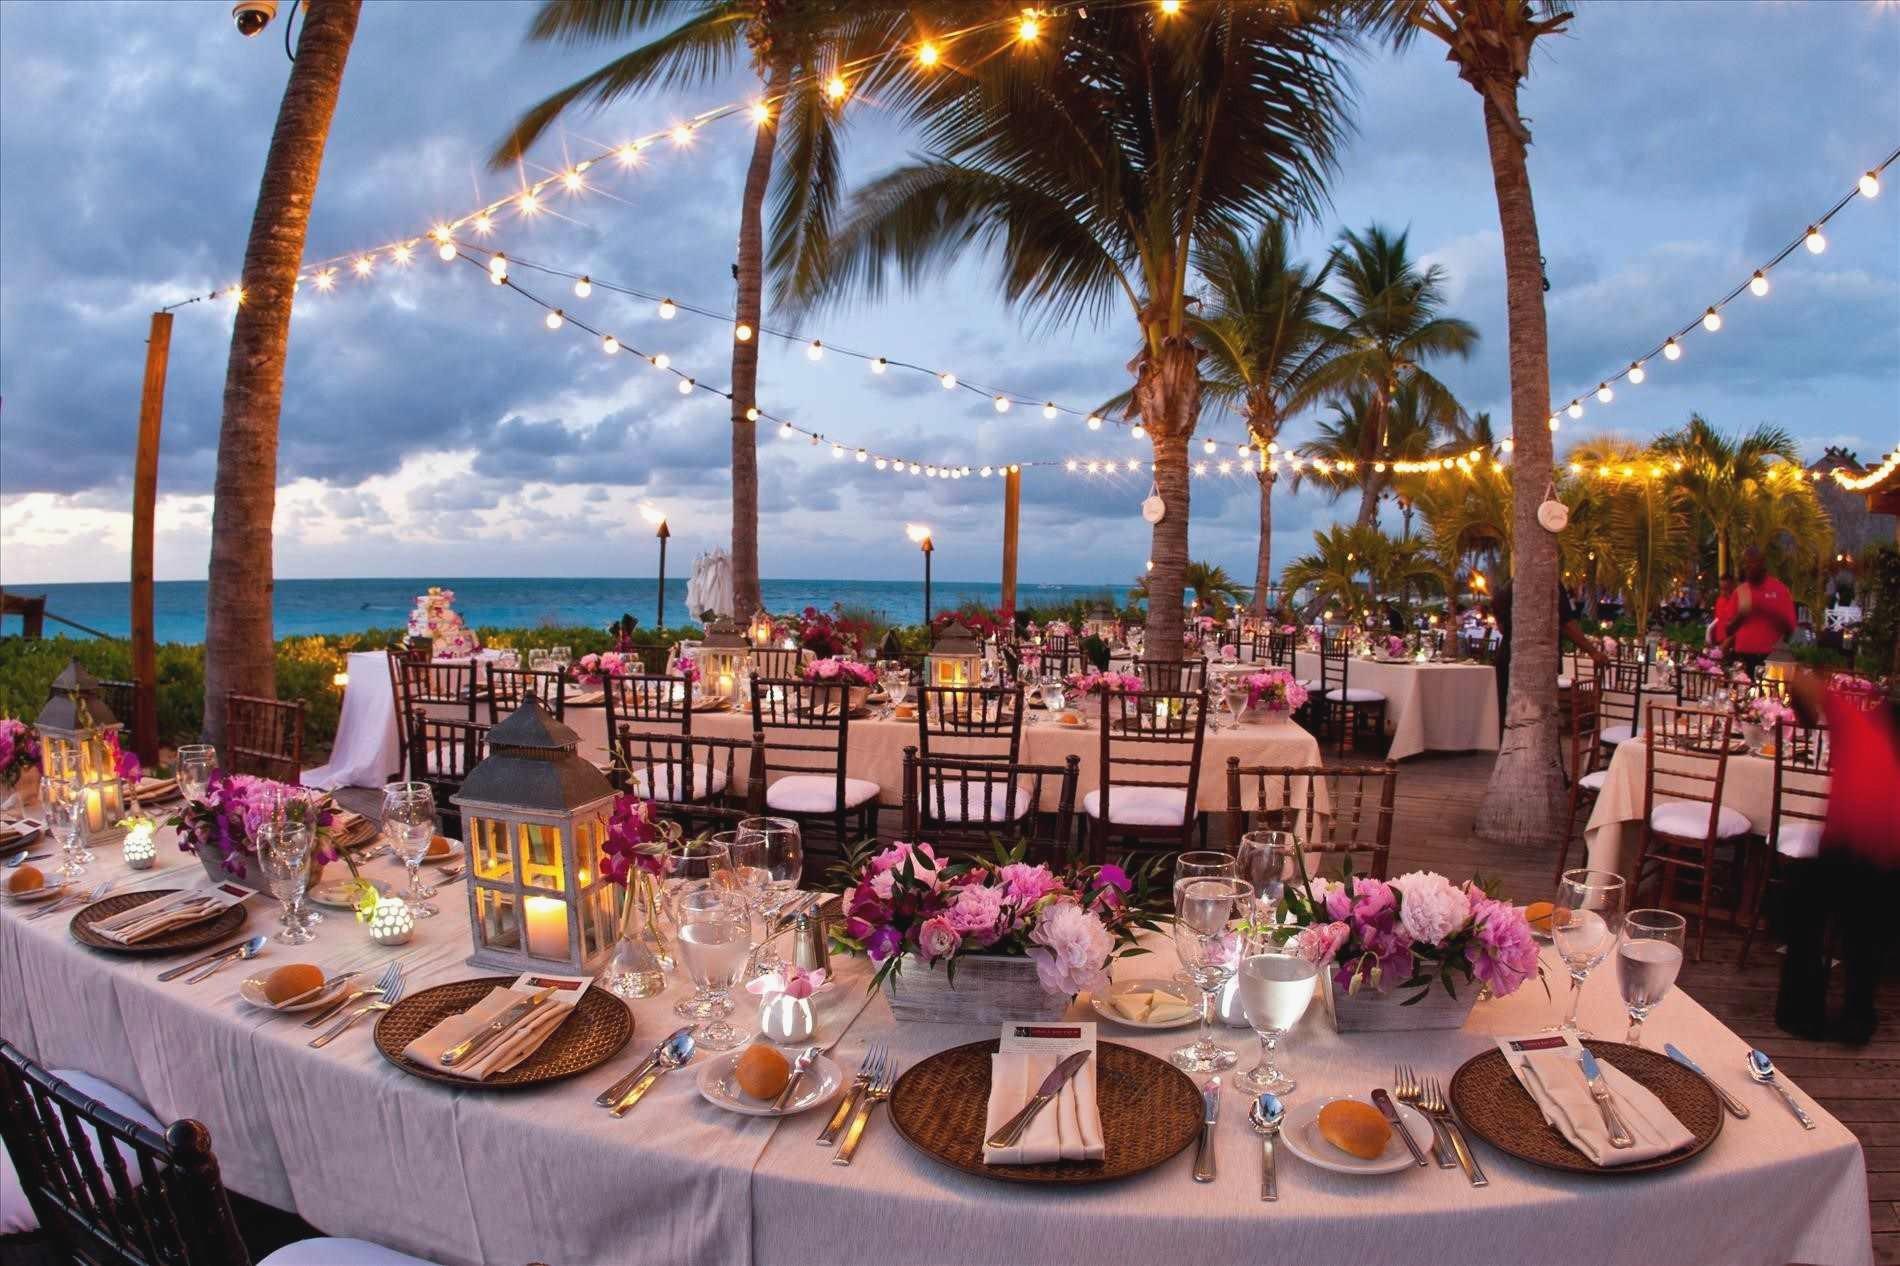 Goa Beach Wedding Cost